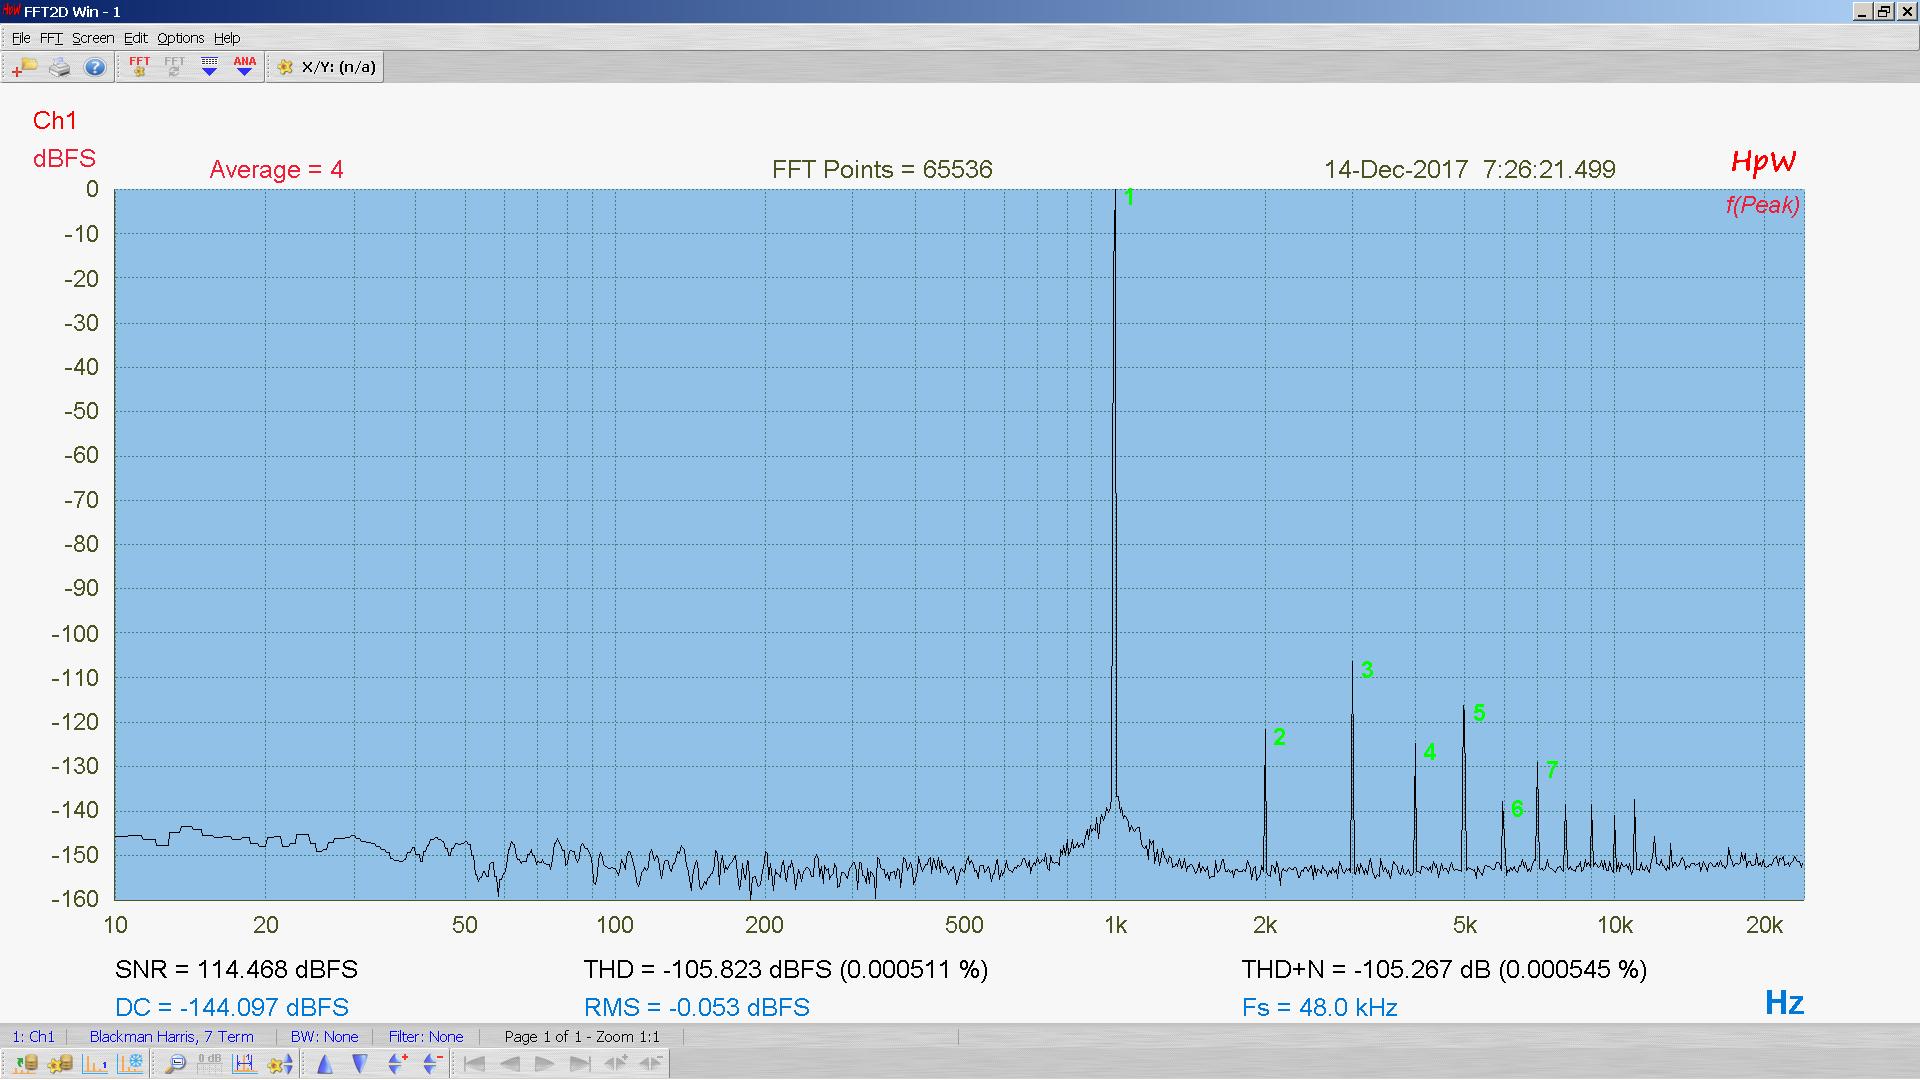 20171214-01 ADI-2 Pro Bal 1KHz THD THD+N spectrum - ASIO - 0 dBFS - HpW.PNG